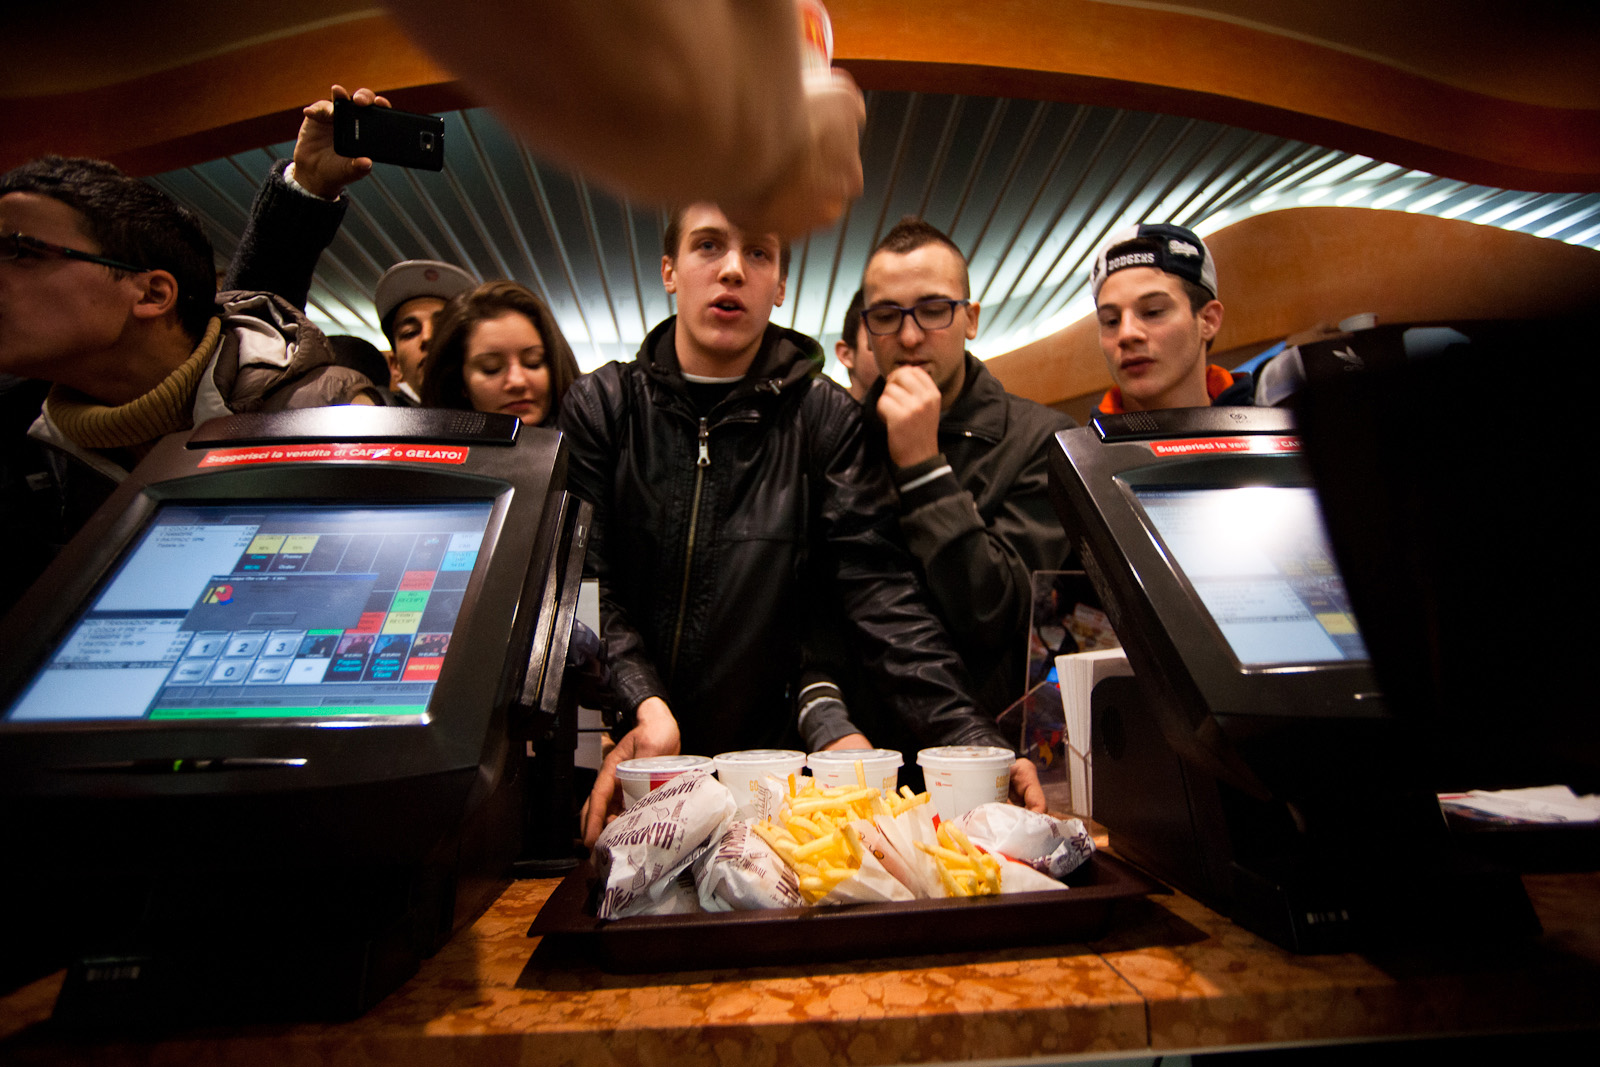 Hamburger patatine e coca gratis